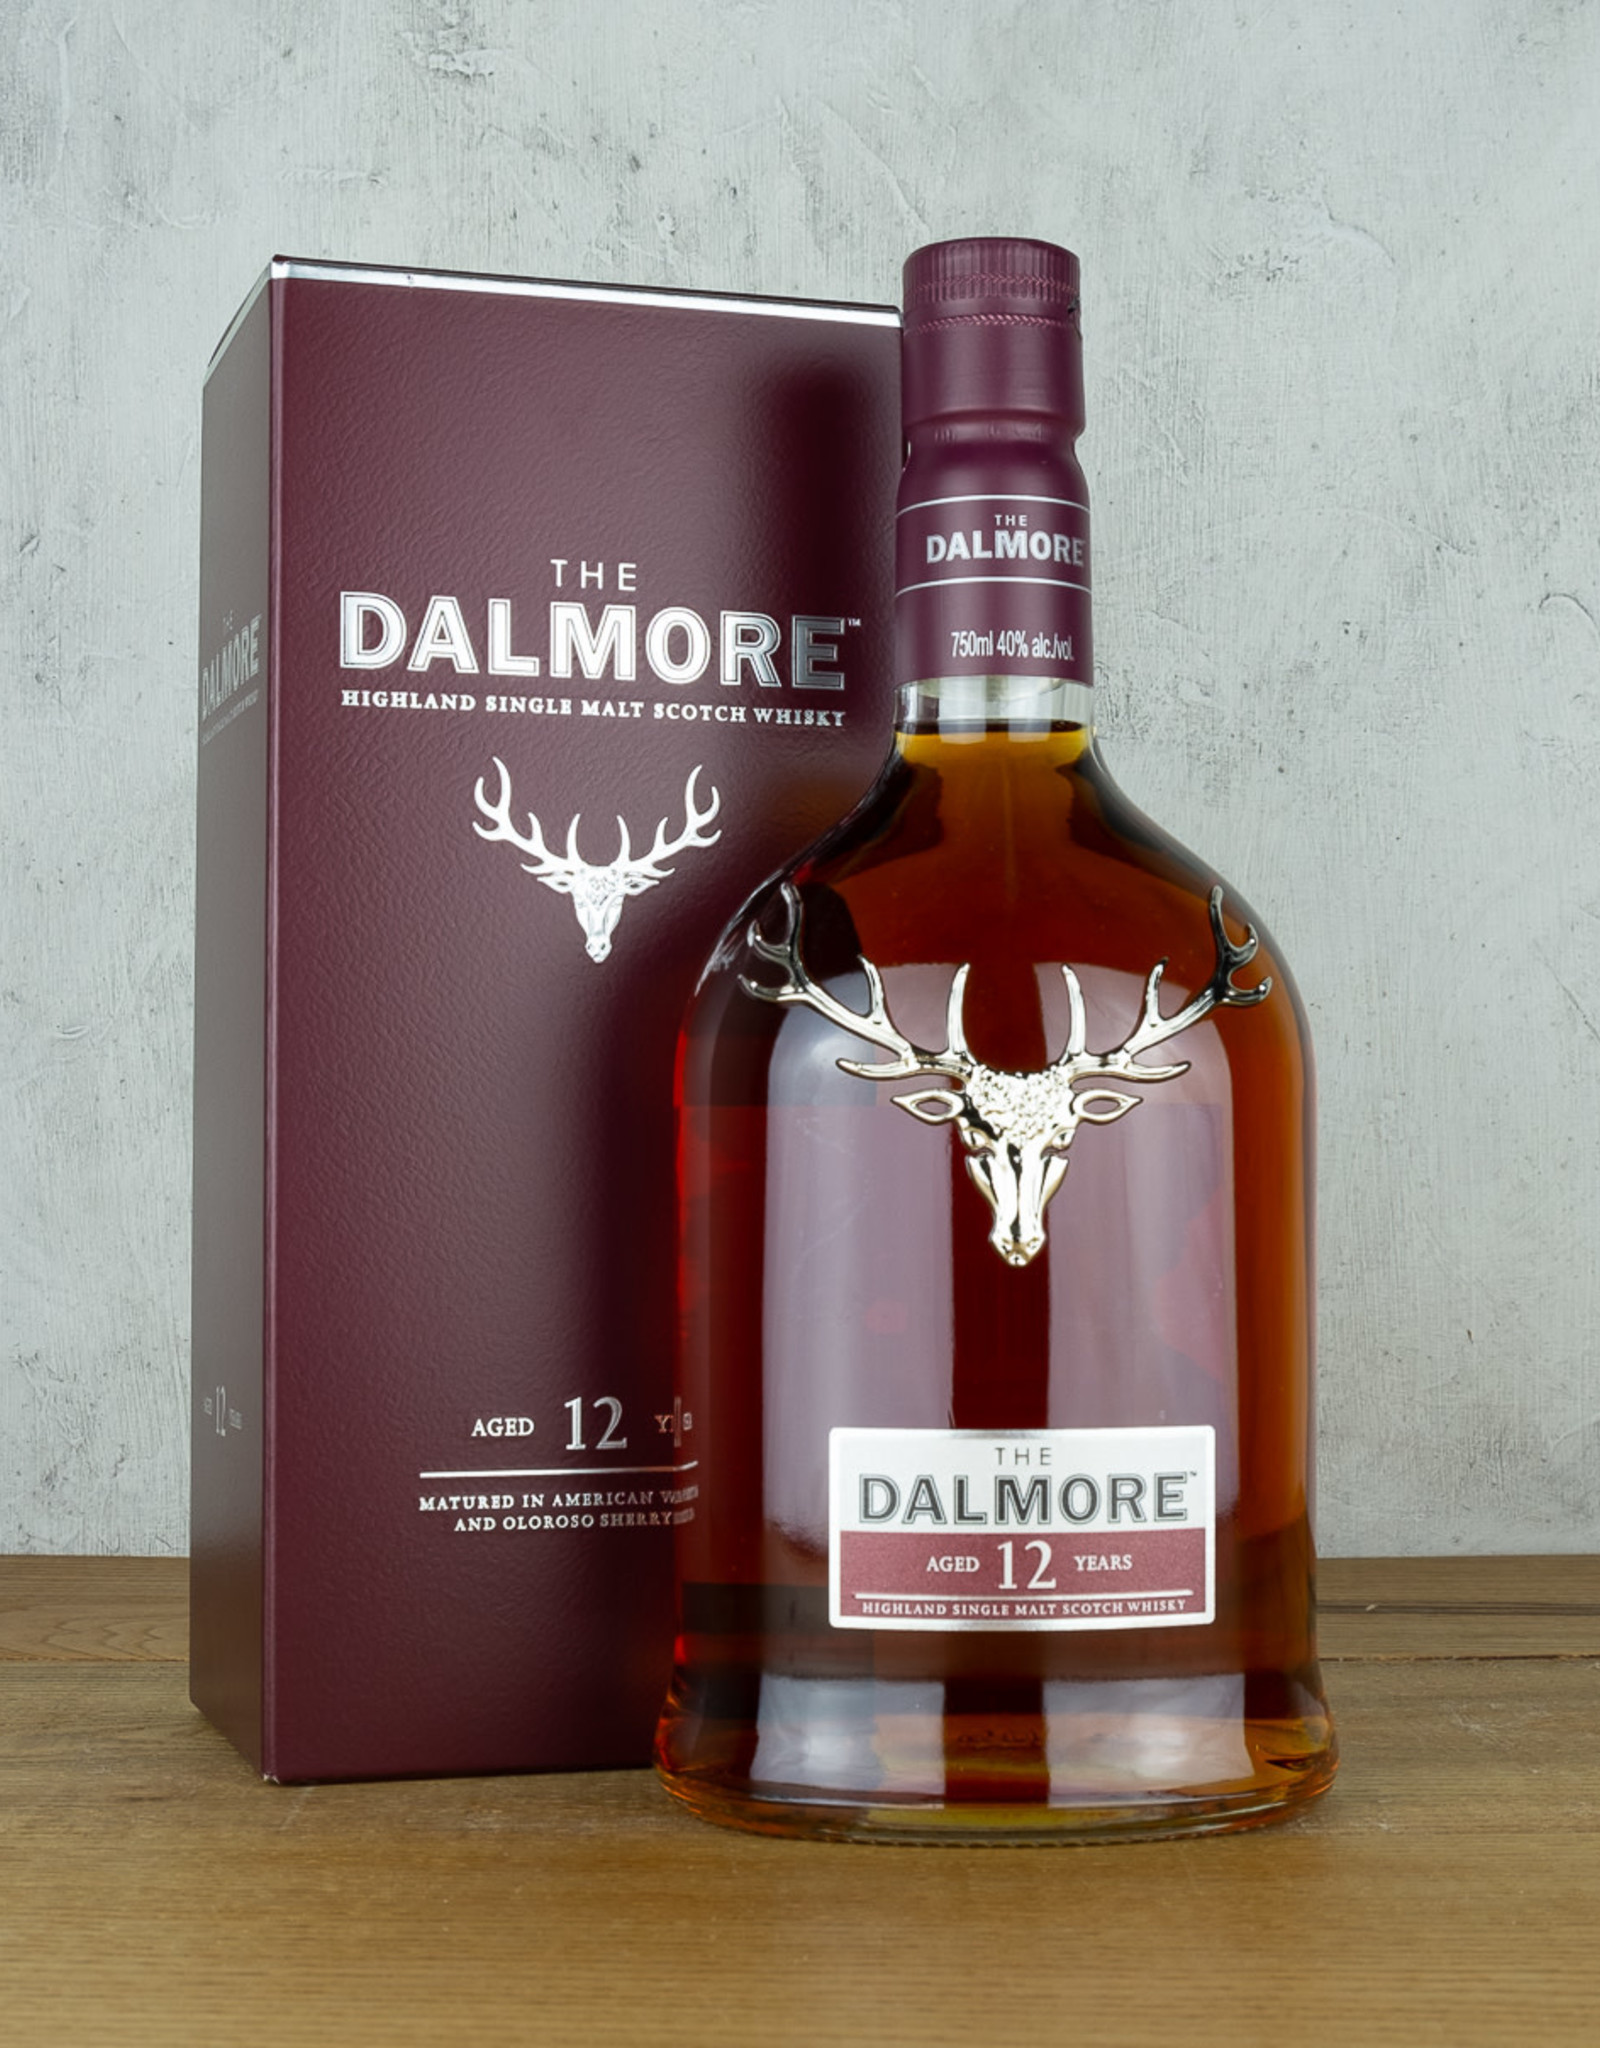 The Dalmore 12yr